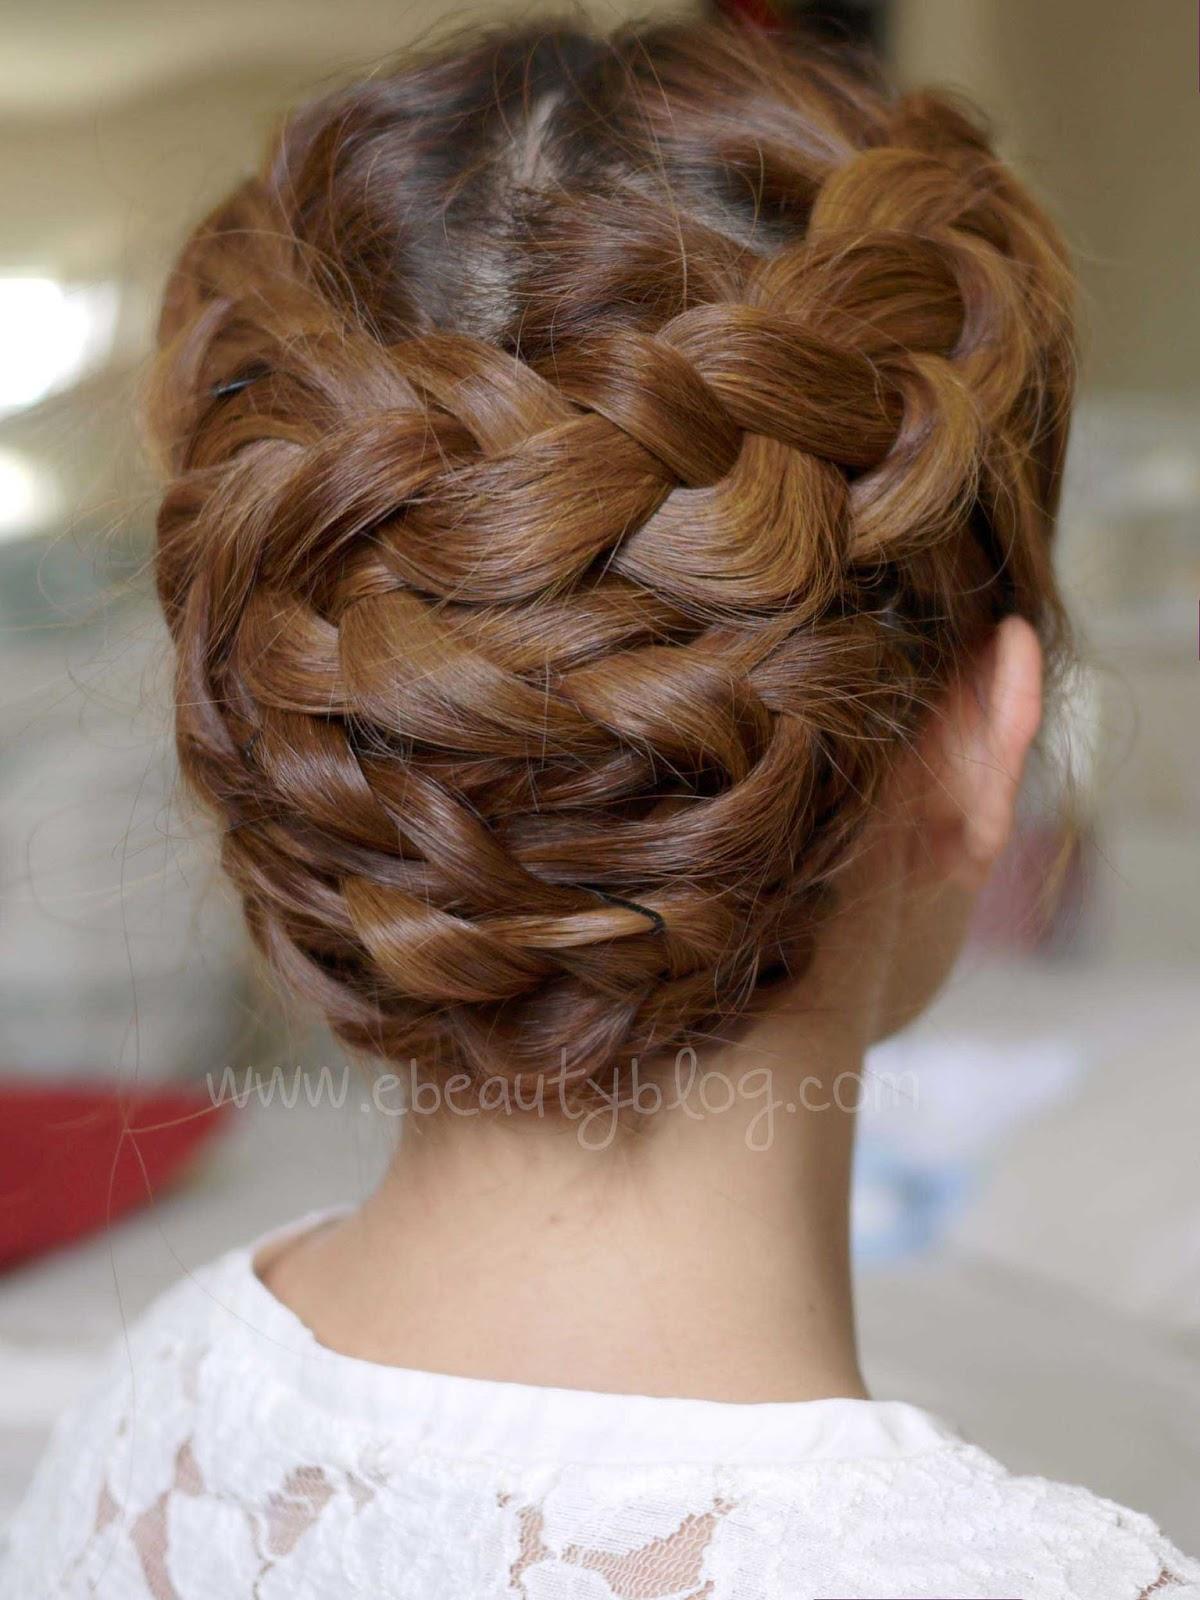 EbeautyBlog com Hair  Tutorial Summer Braided  Updo